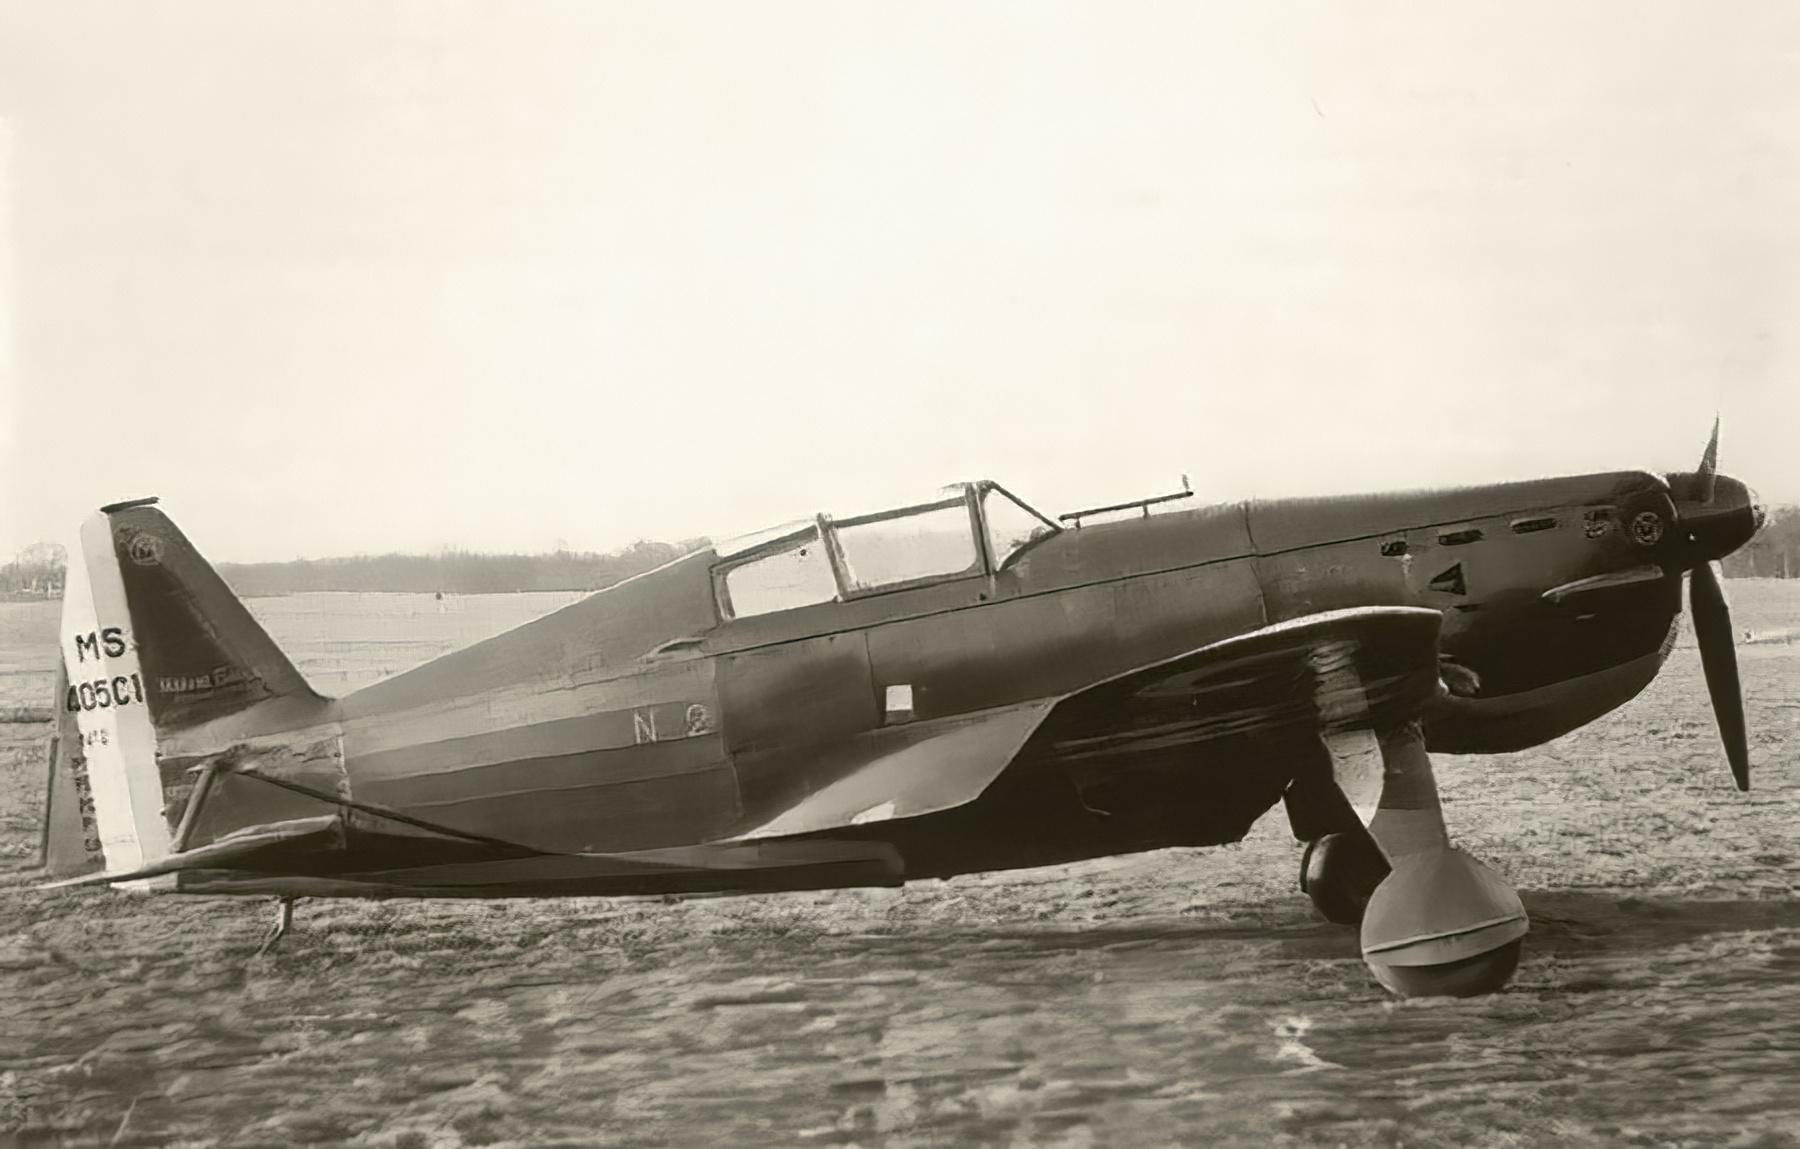 French Airforce Morane Saulnier MS 406C1 sn2 France 1940 web 01